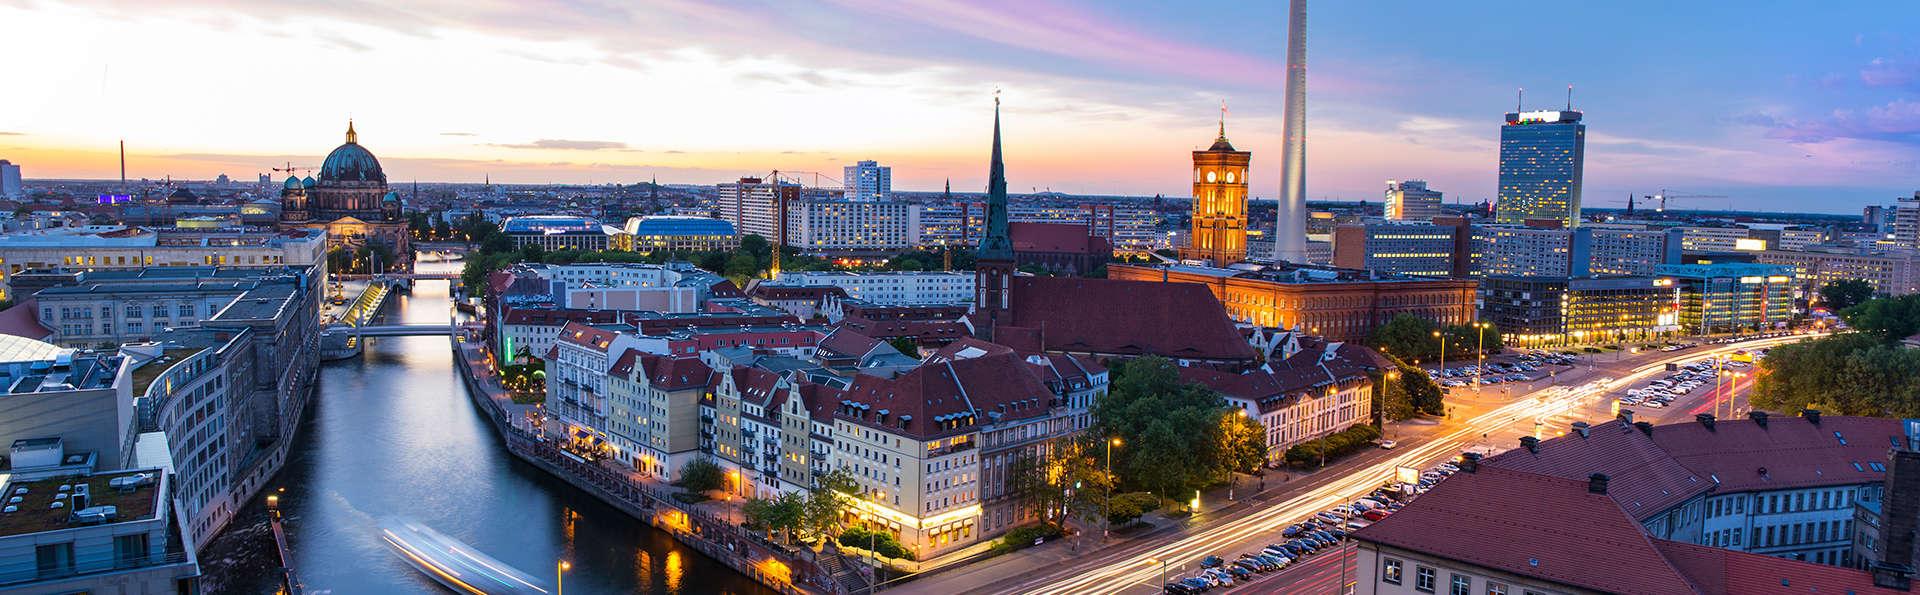 Seminaris Campushotel Berlin - EDIT_BERLIN11.jpg